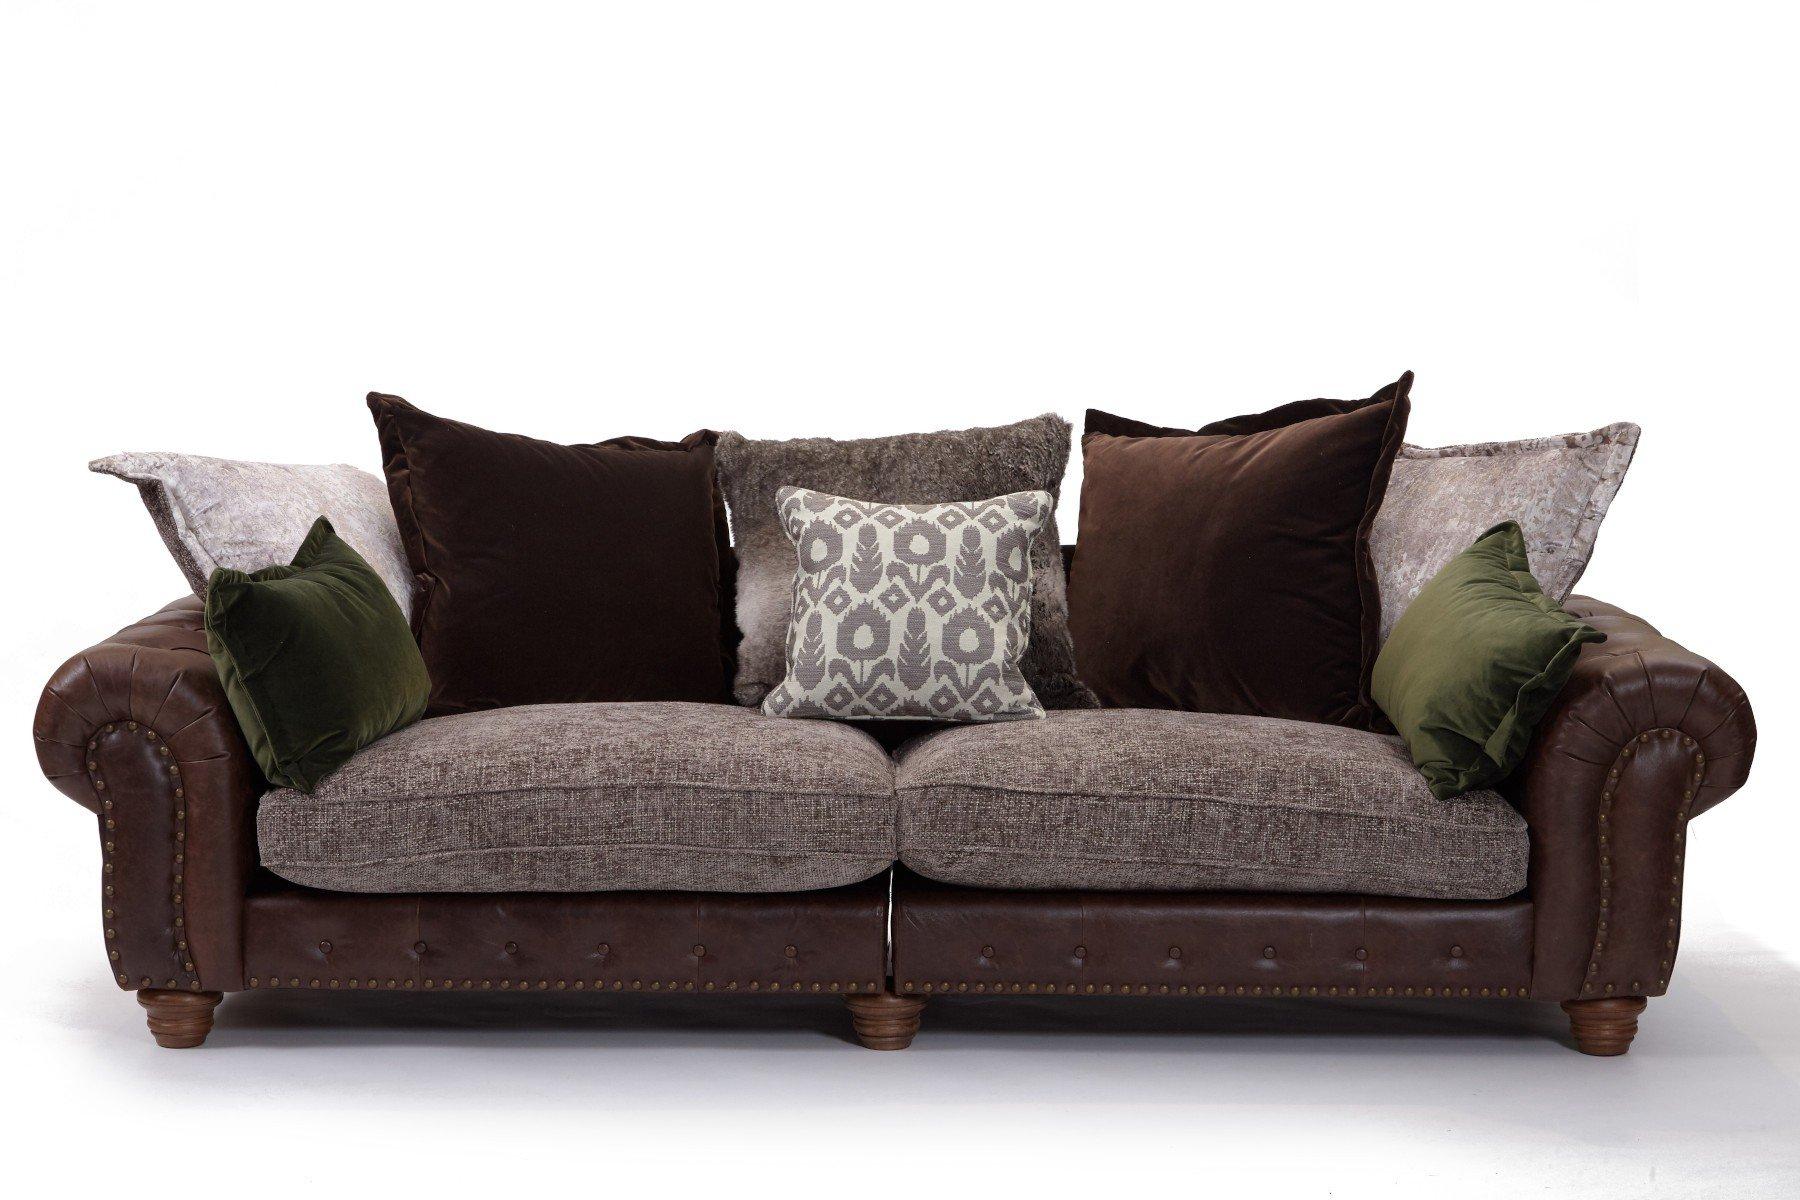 Wilson 4 Seater Sofa